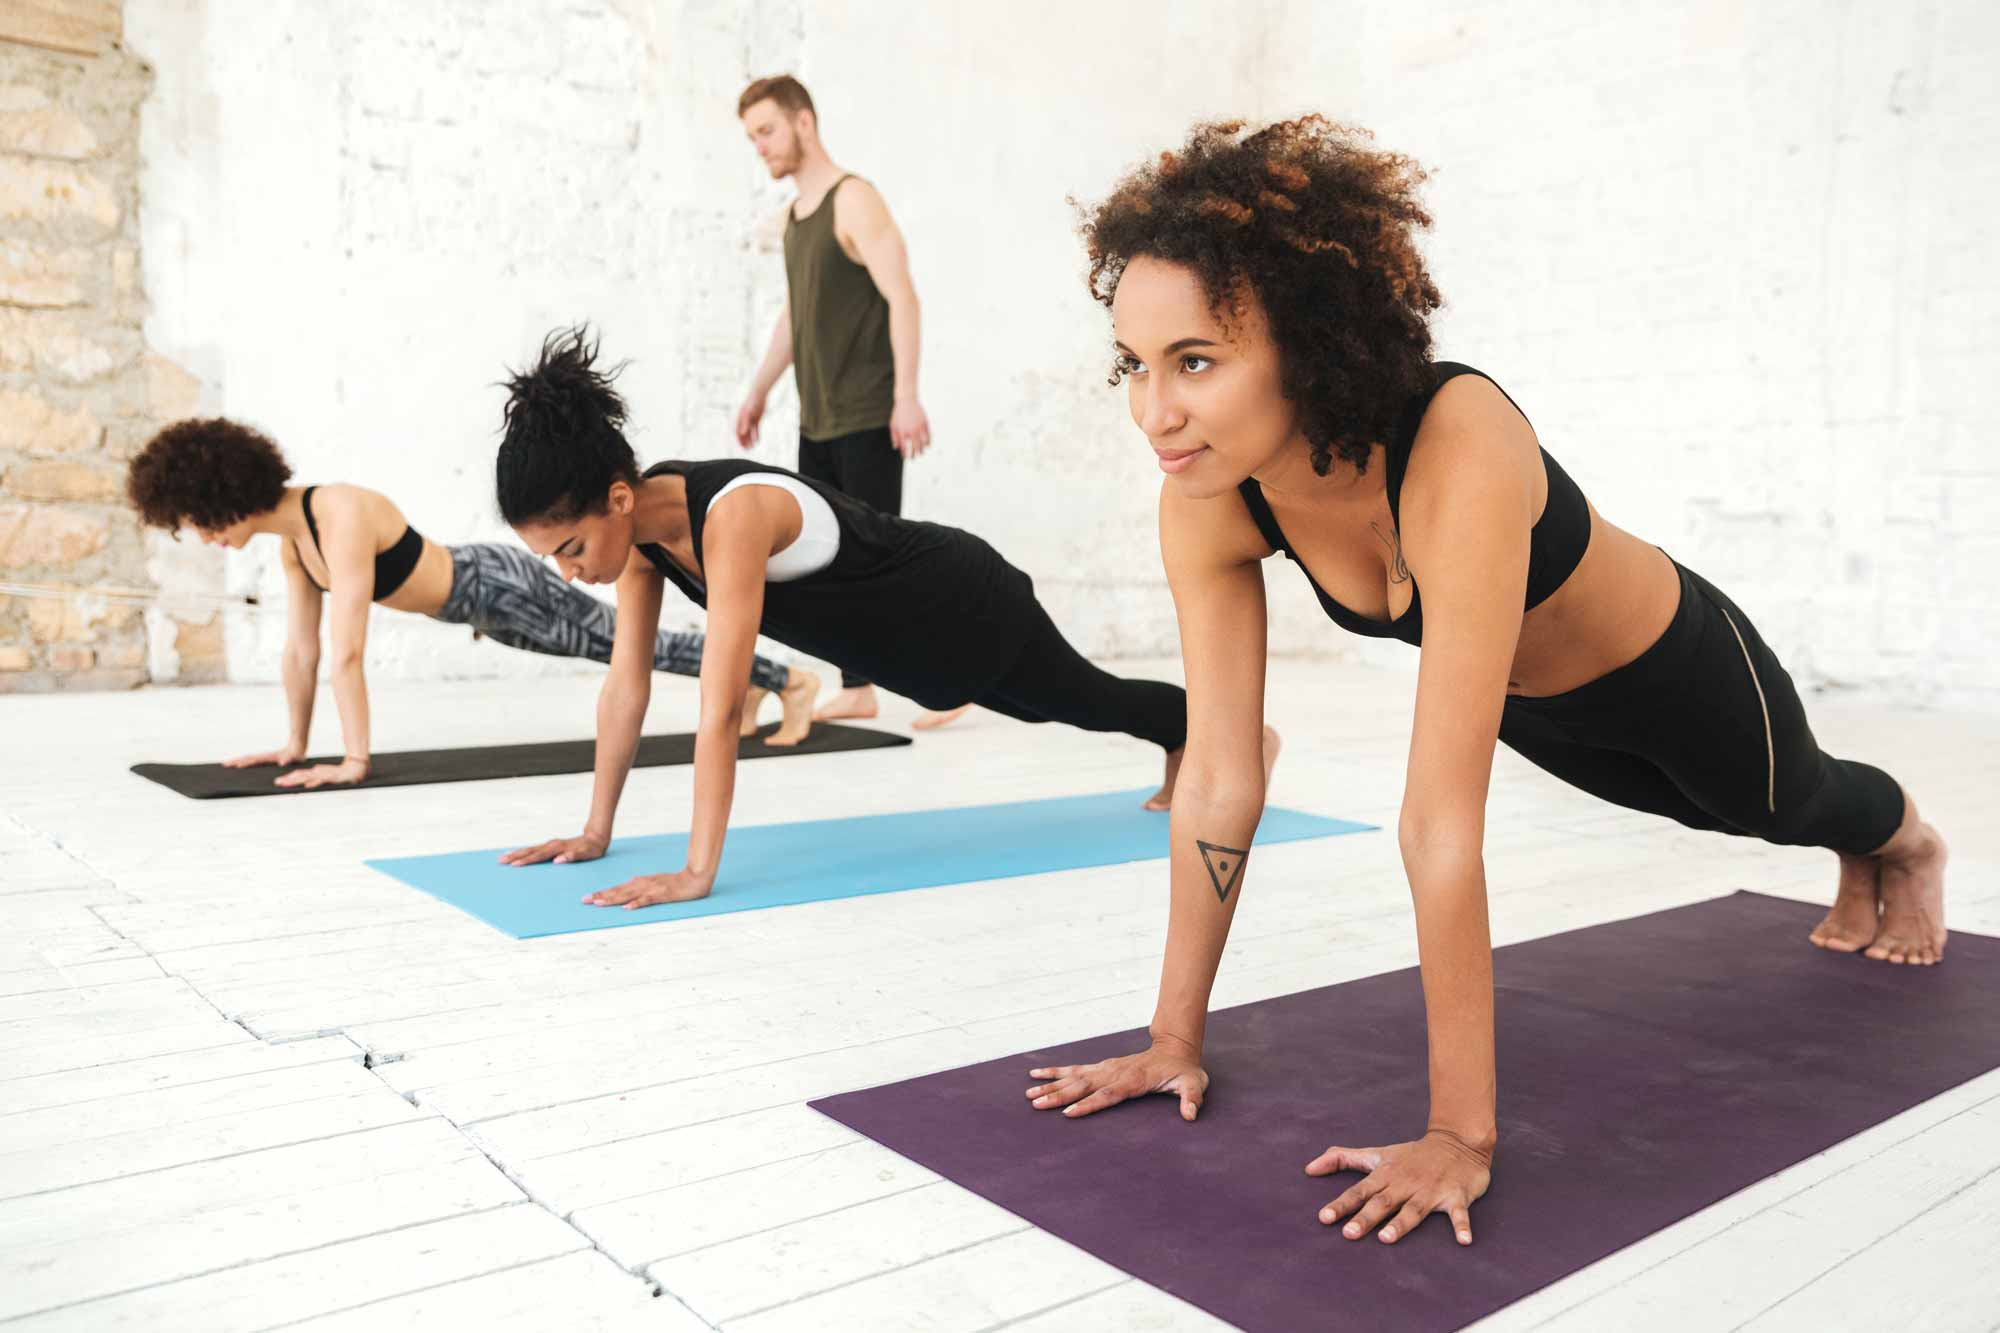 Salud y Fisioterapia Joel Fitness Baleares